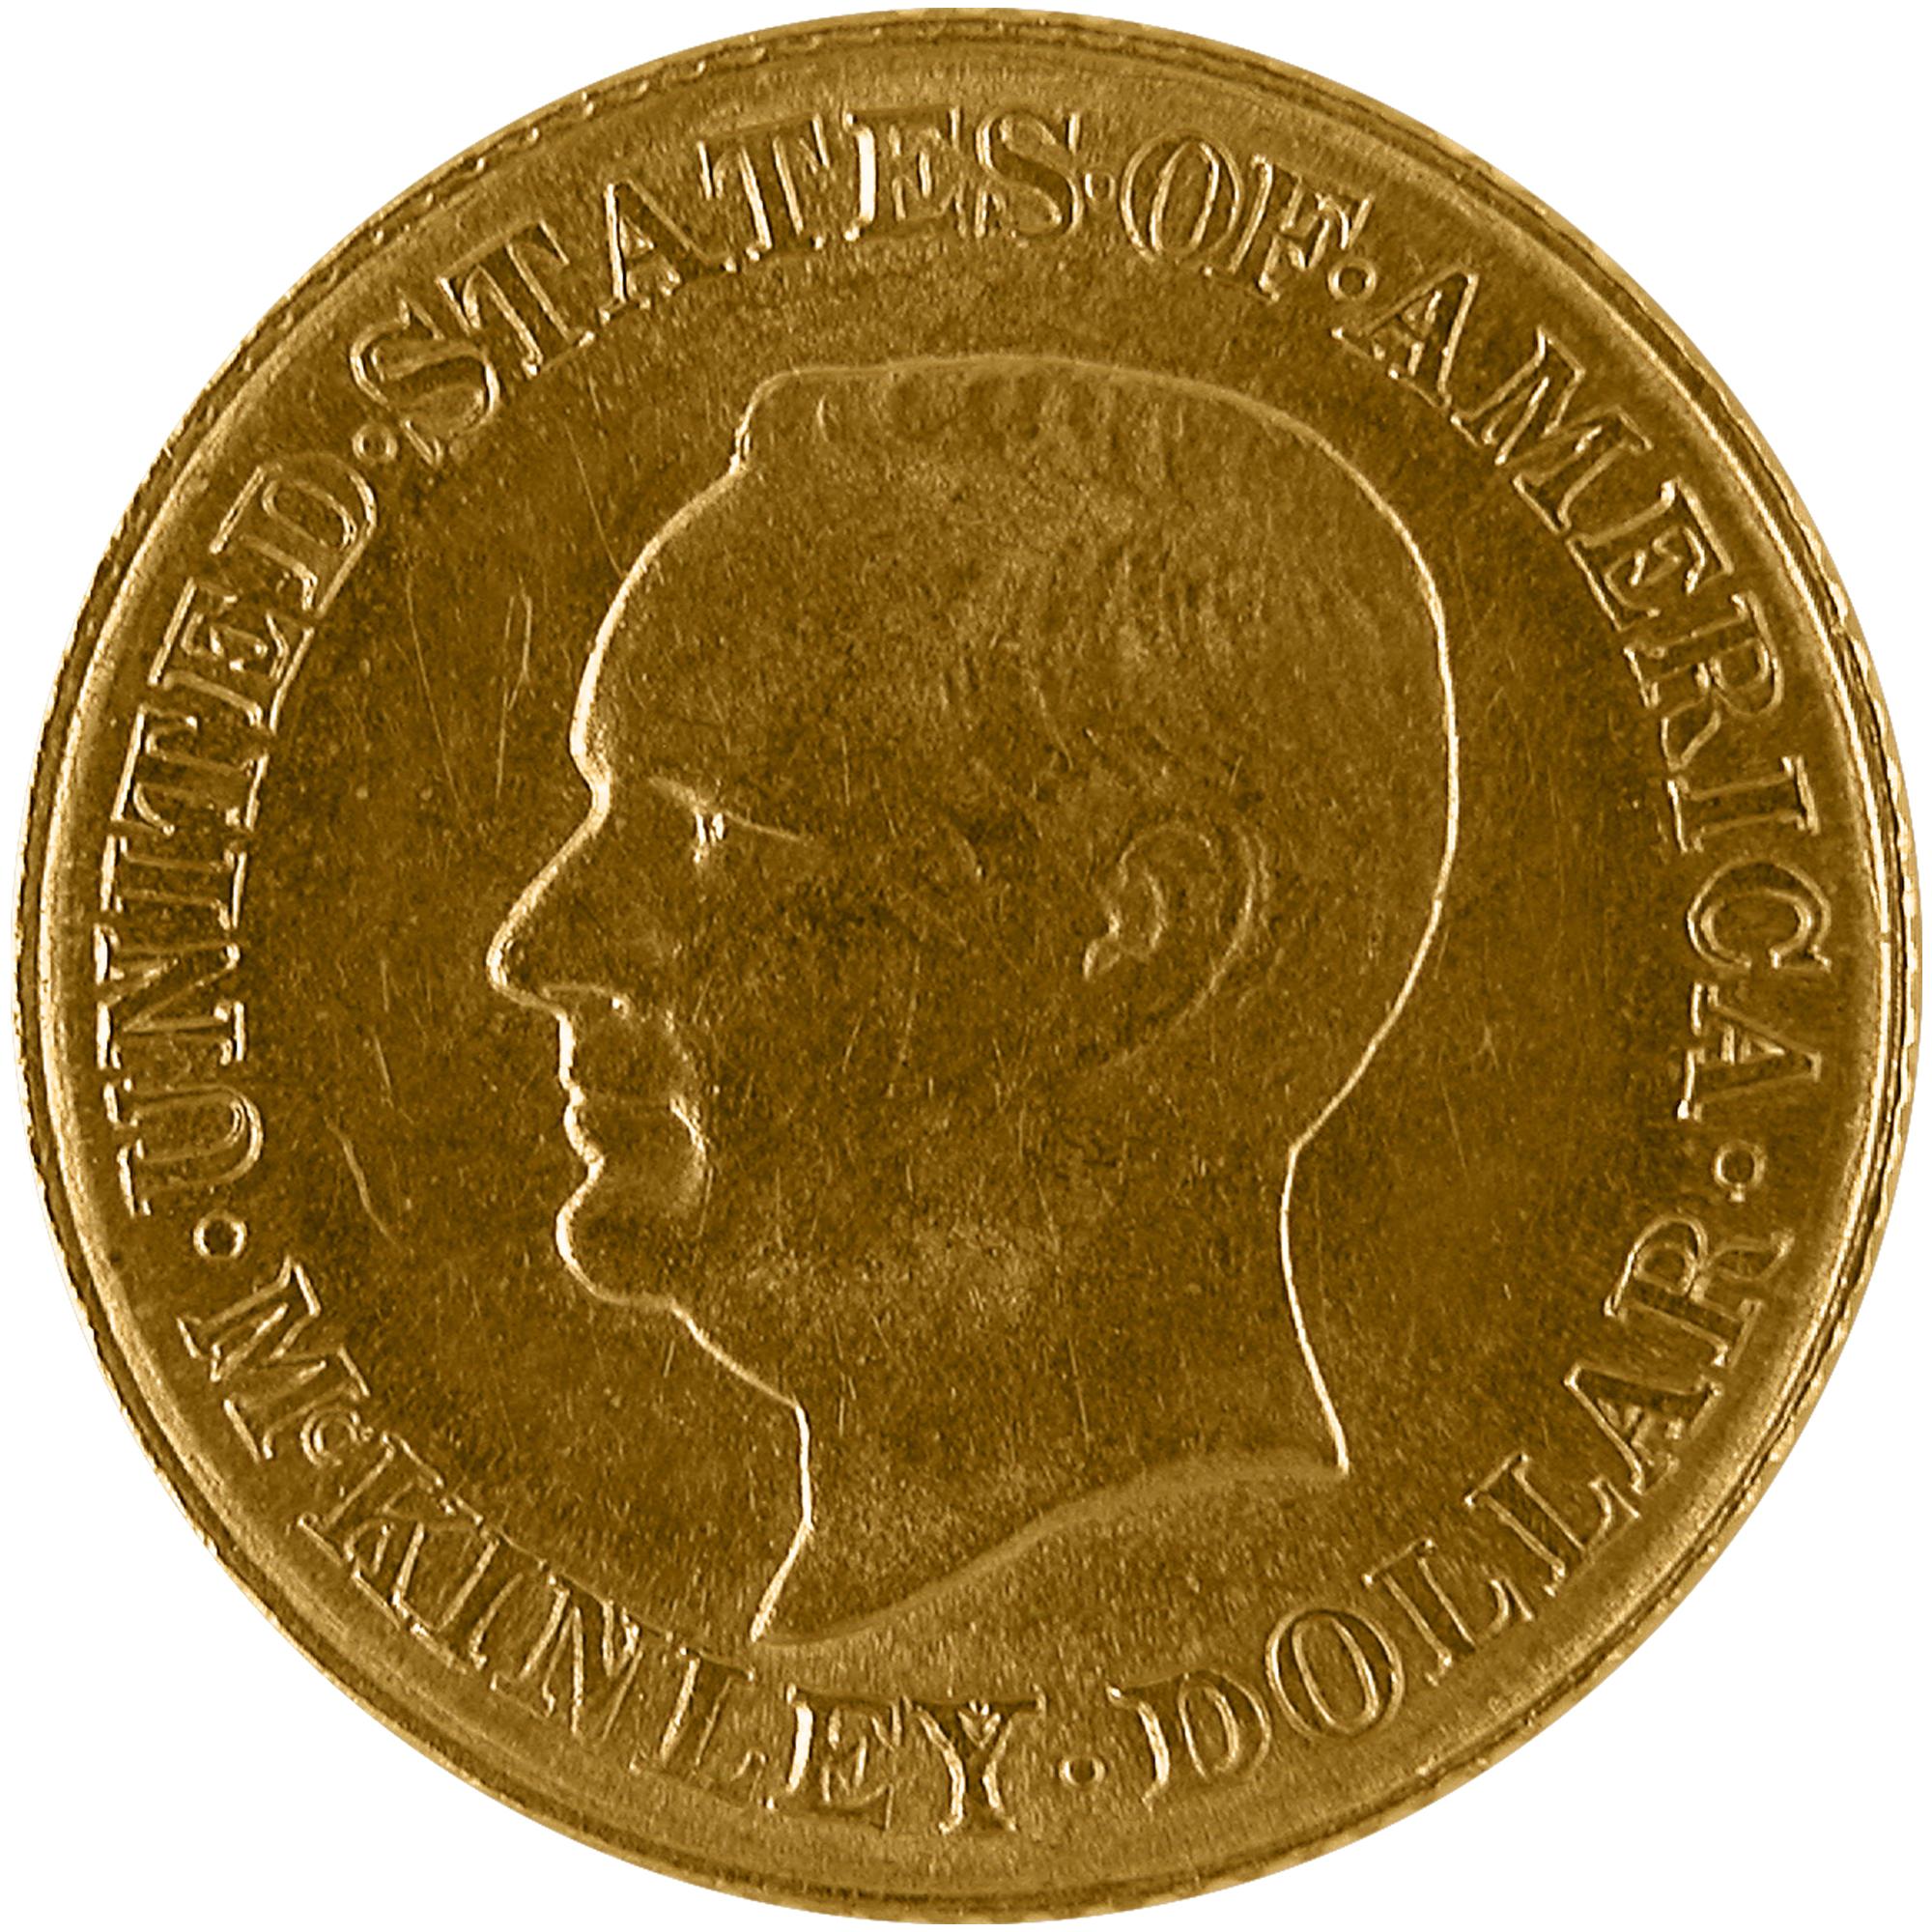 1916 William Mckinley Memorial Commemorative Gold One Dollar Coin Obverse